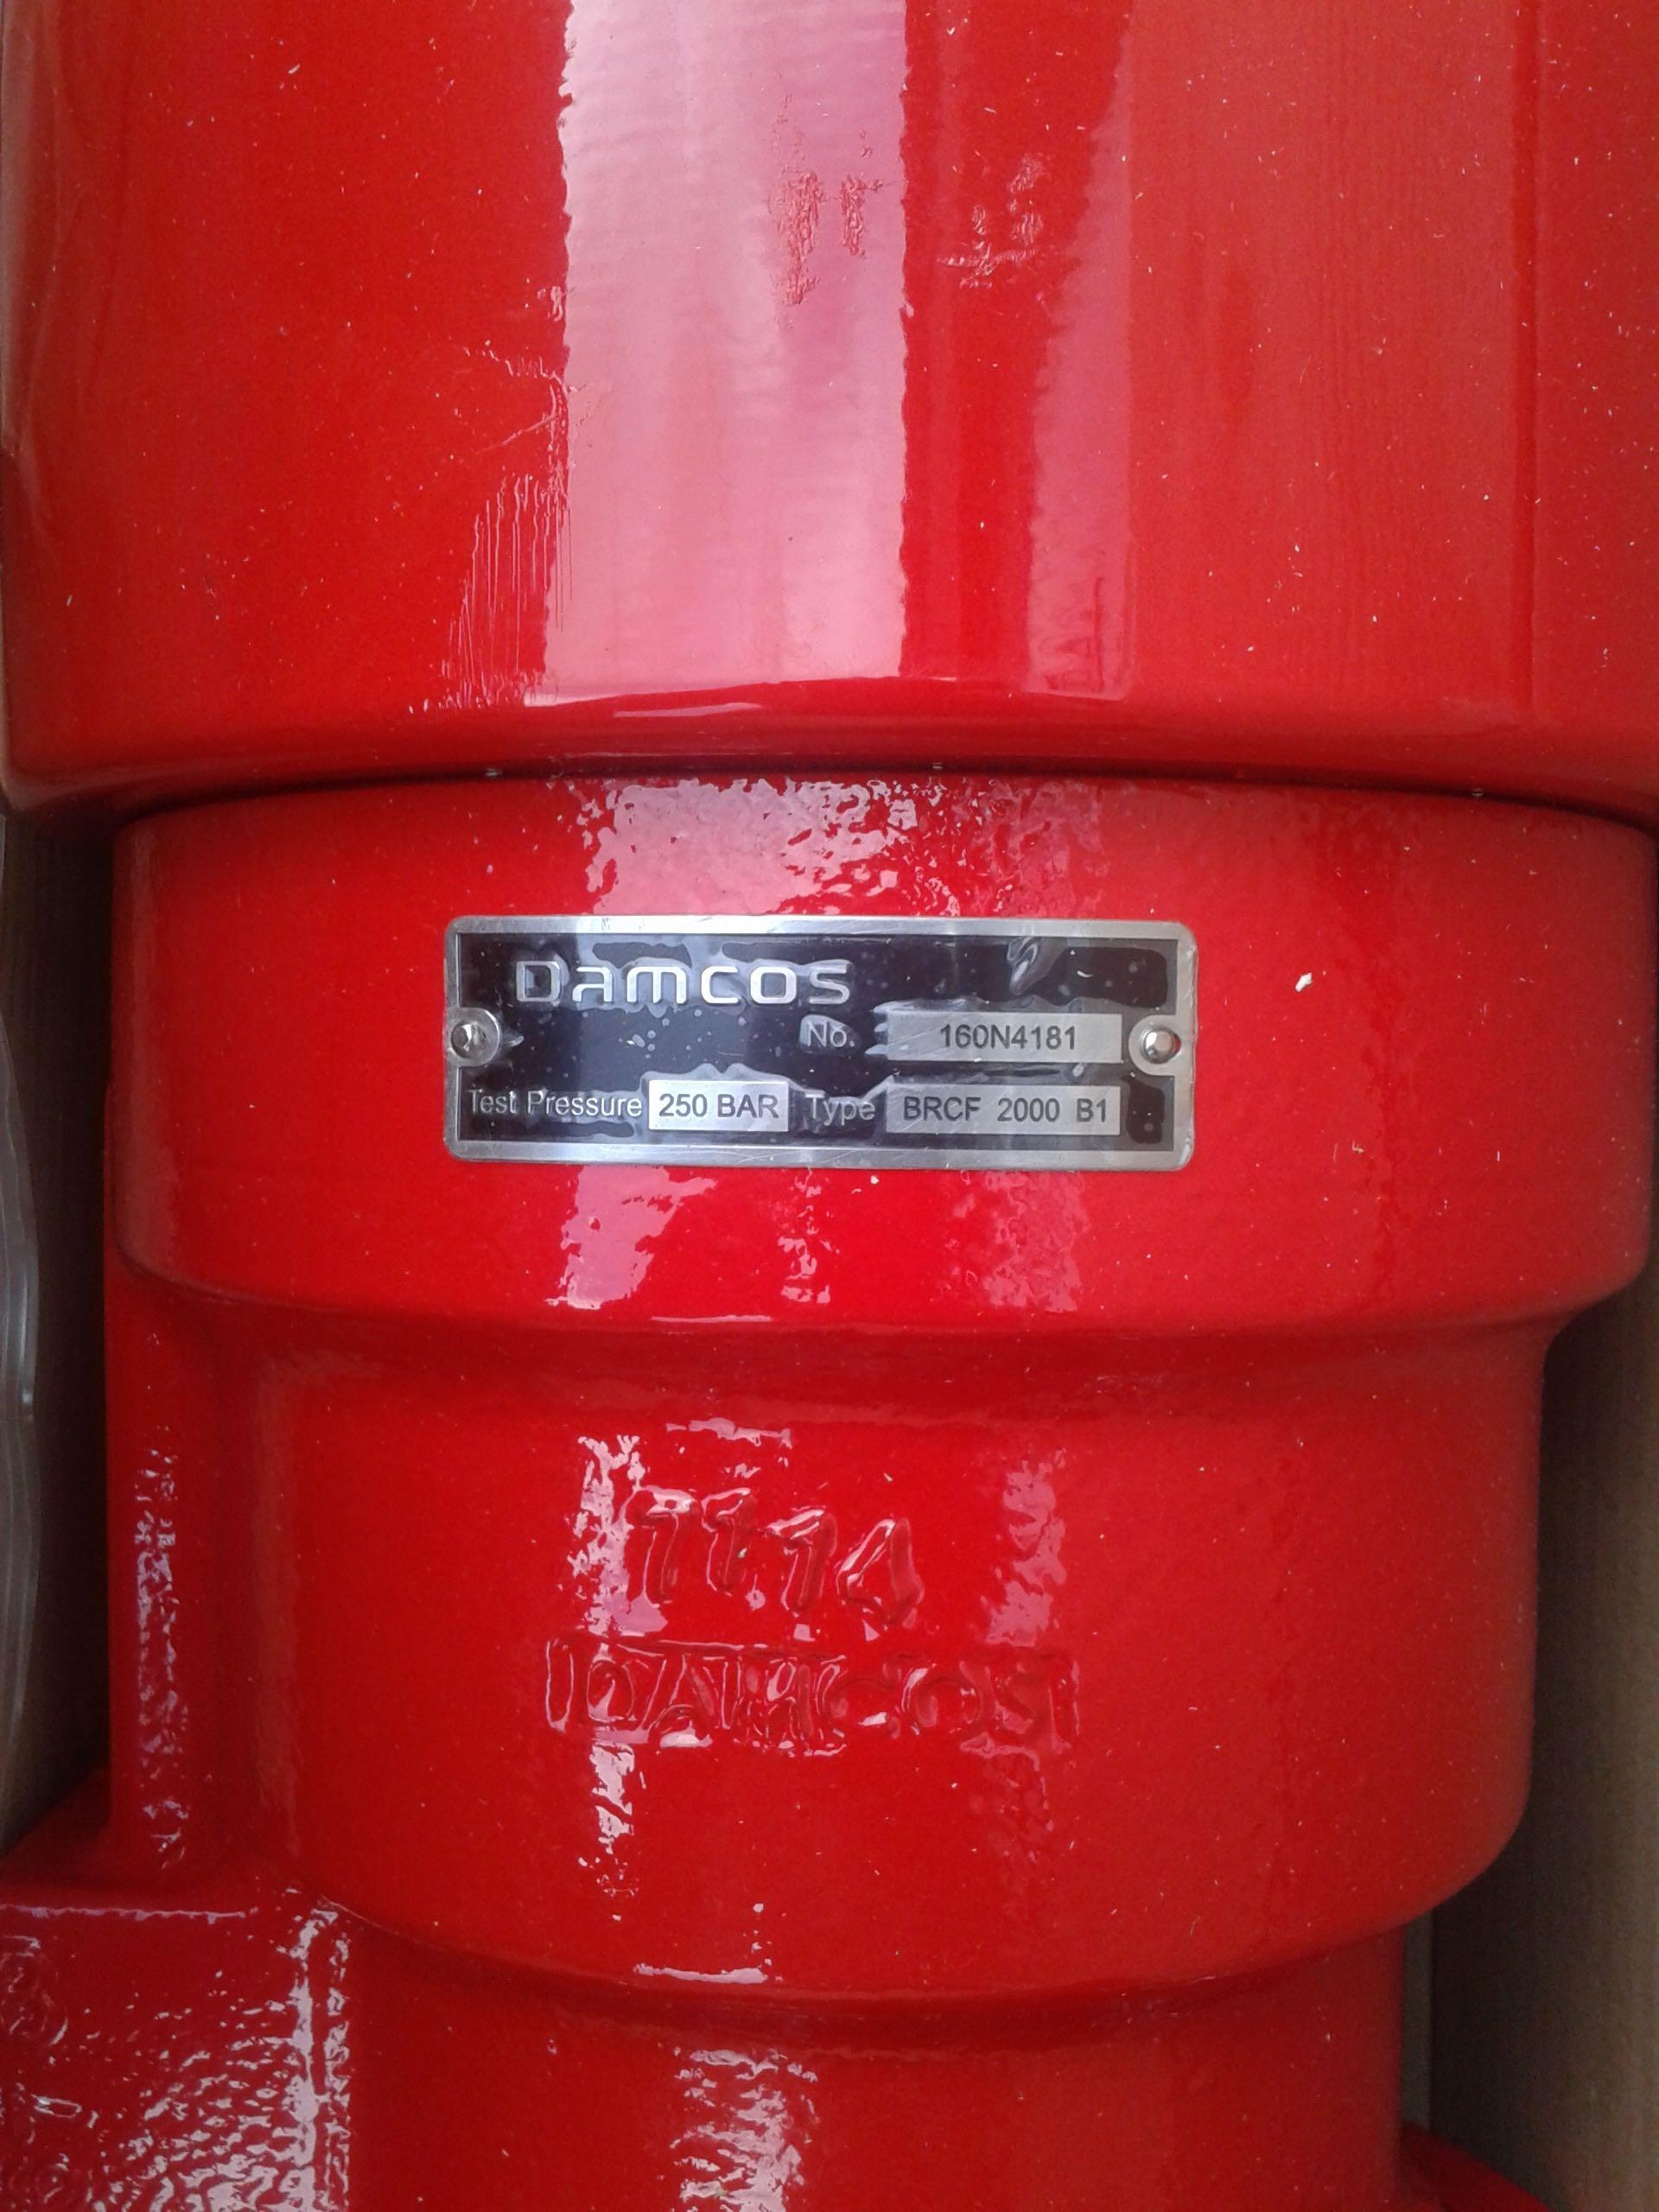 Damcos : Danfoss BRCF 2000 B1 Actuator, 160N4181